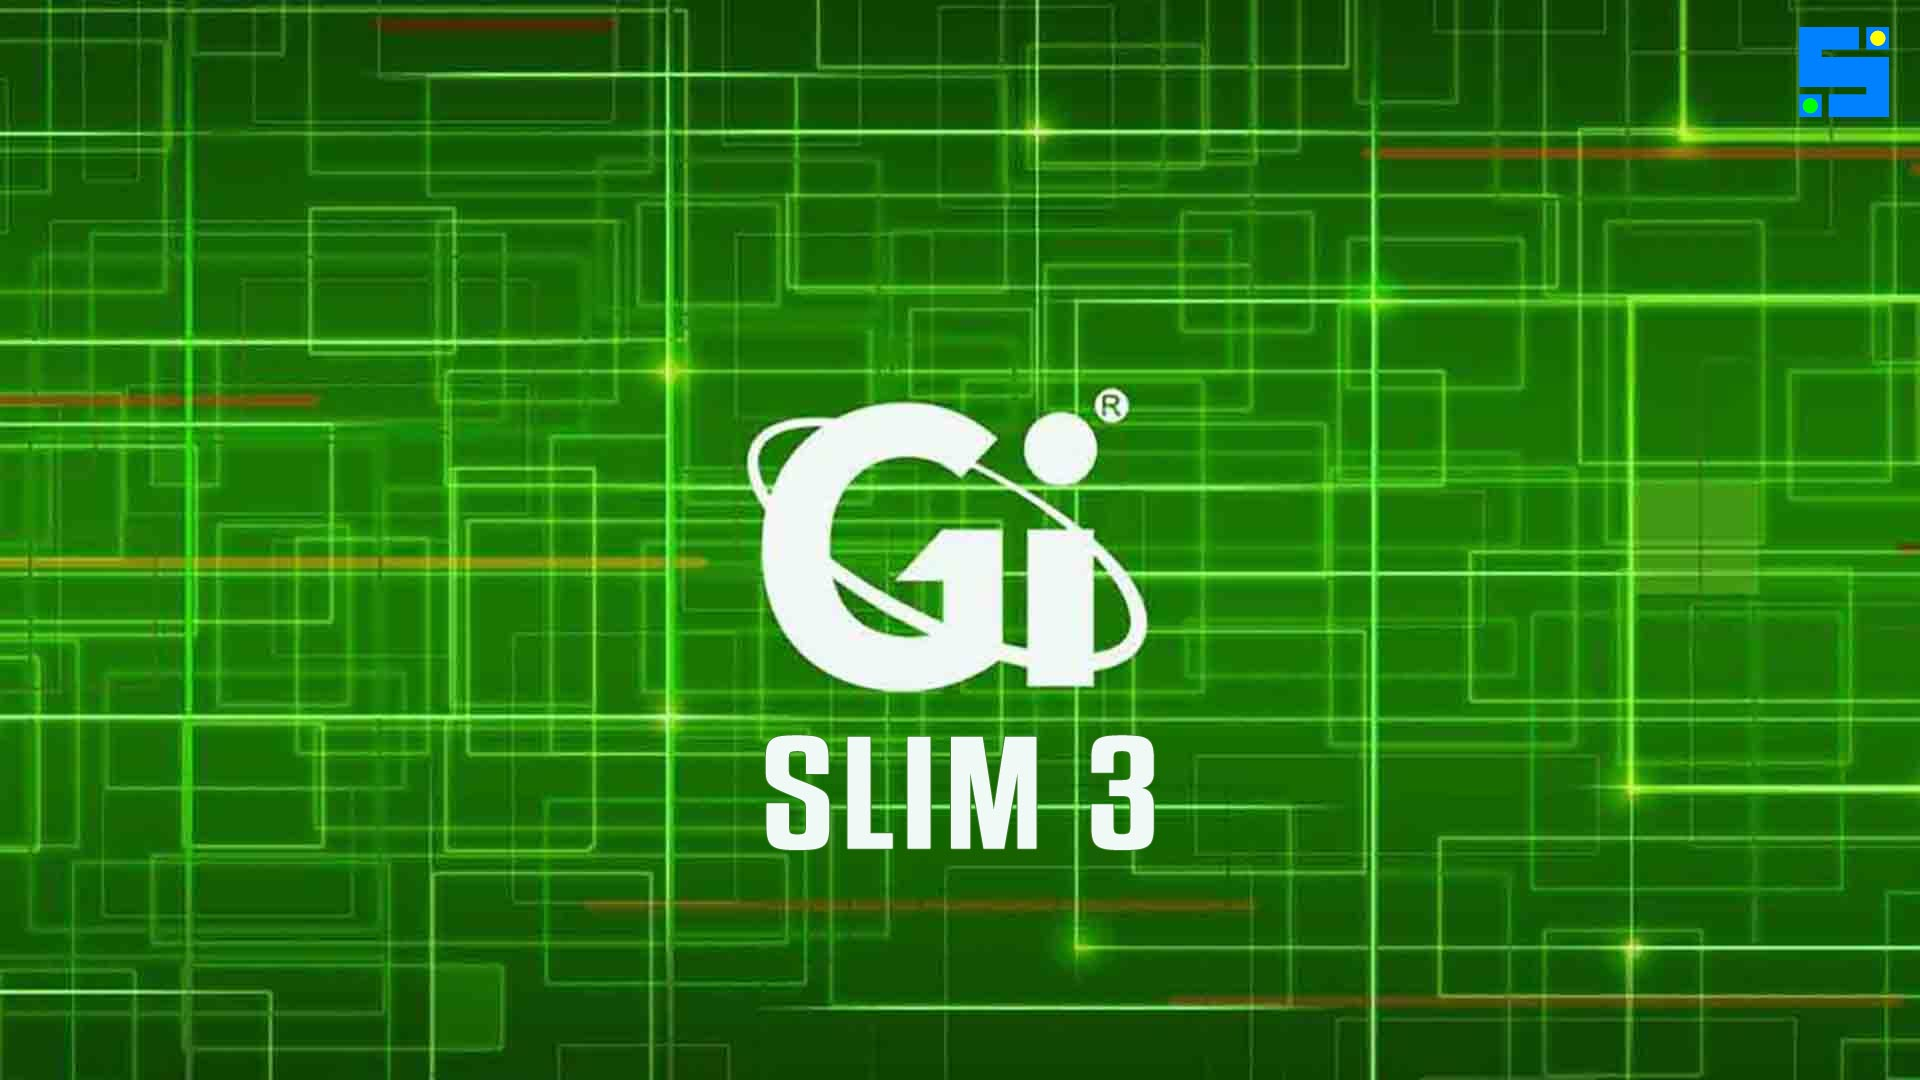 Download Galaxy Innovations GI HD Slim 3 M Firmware Receiver